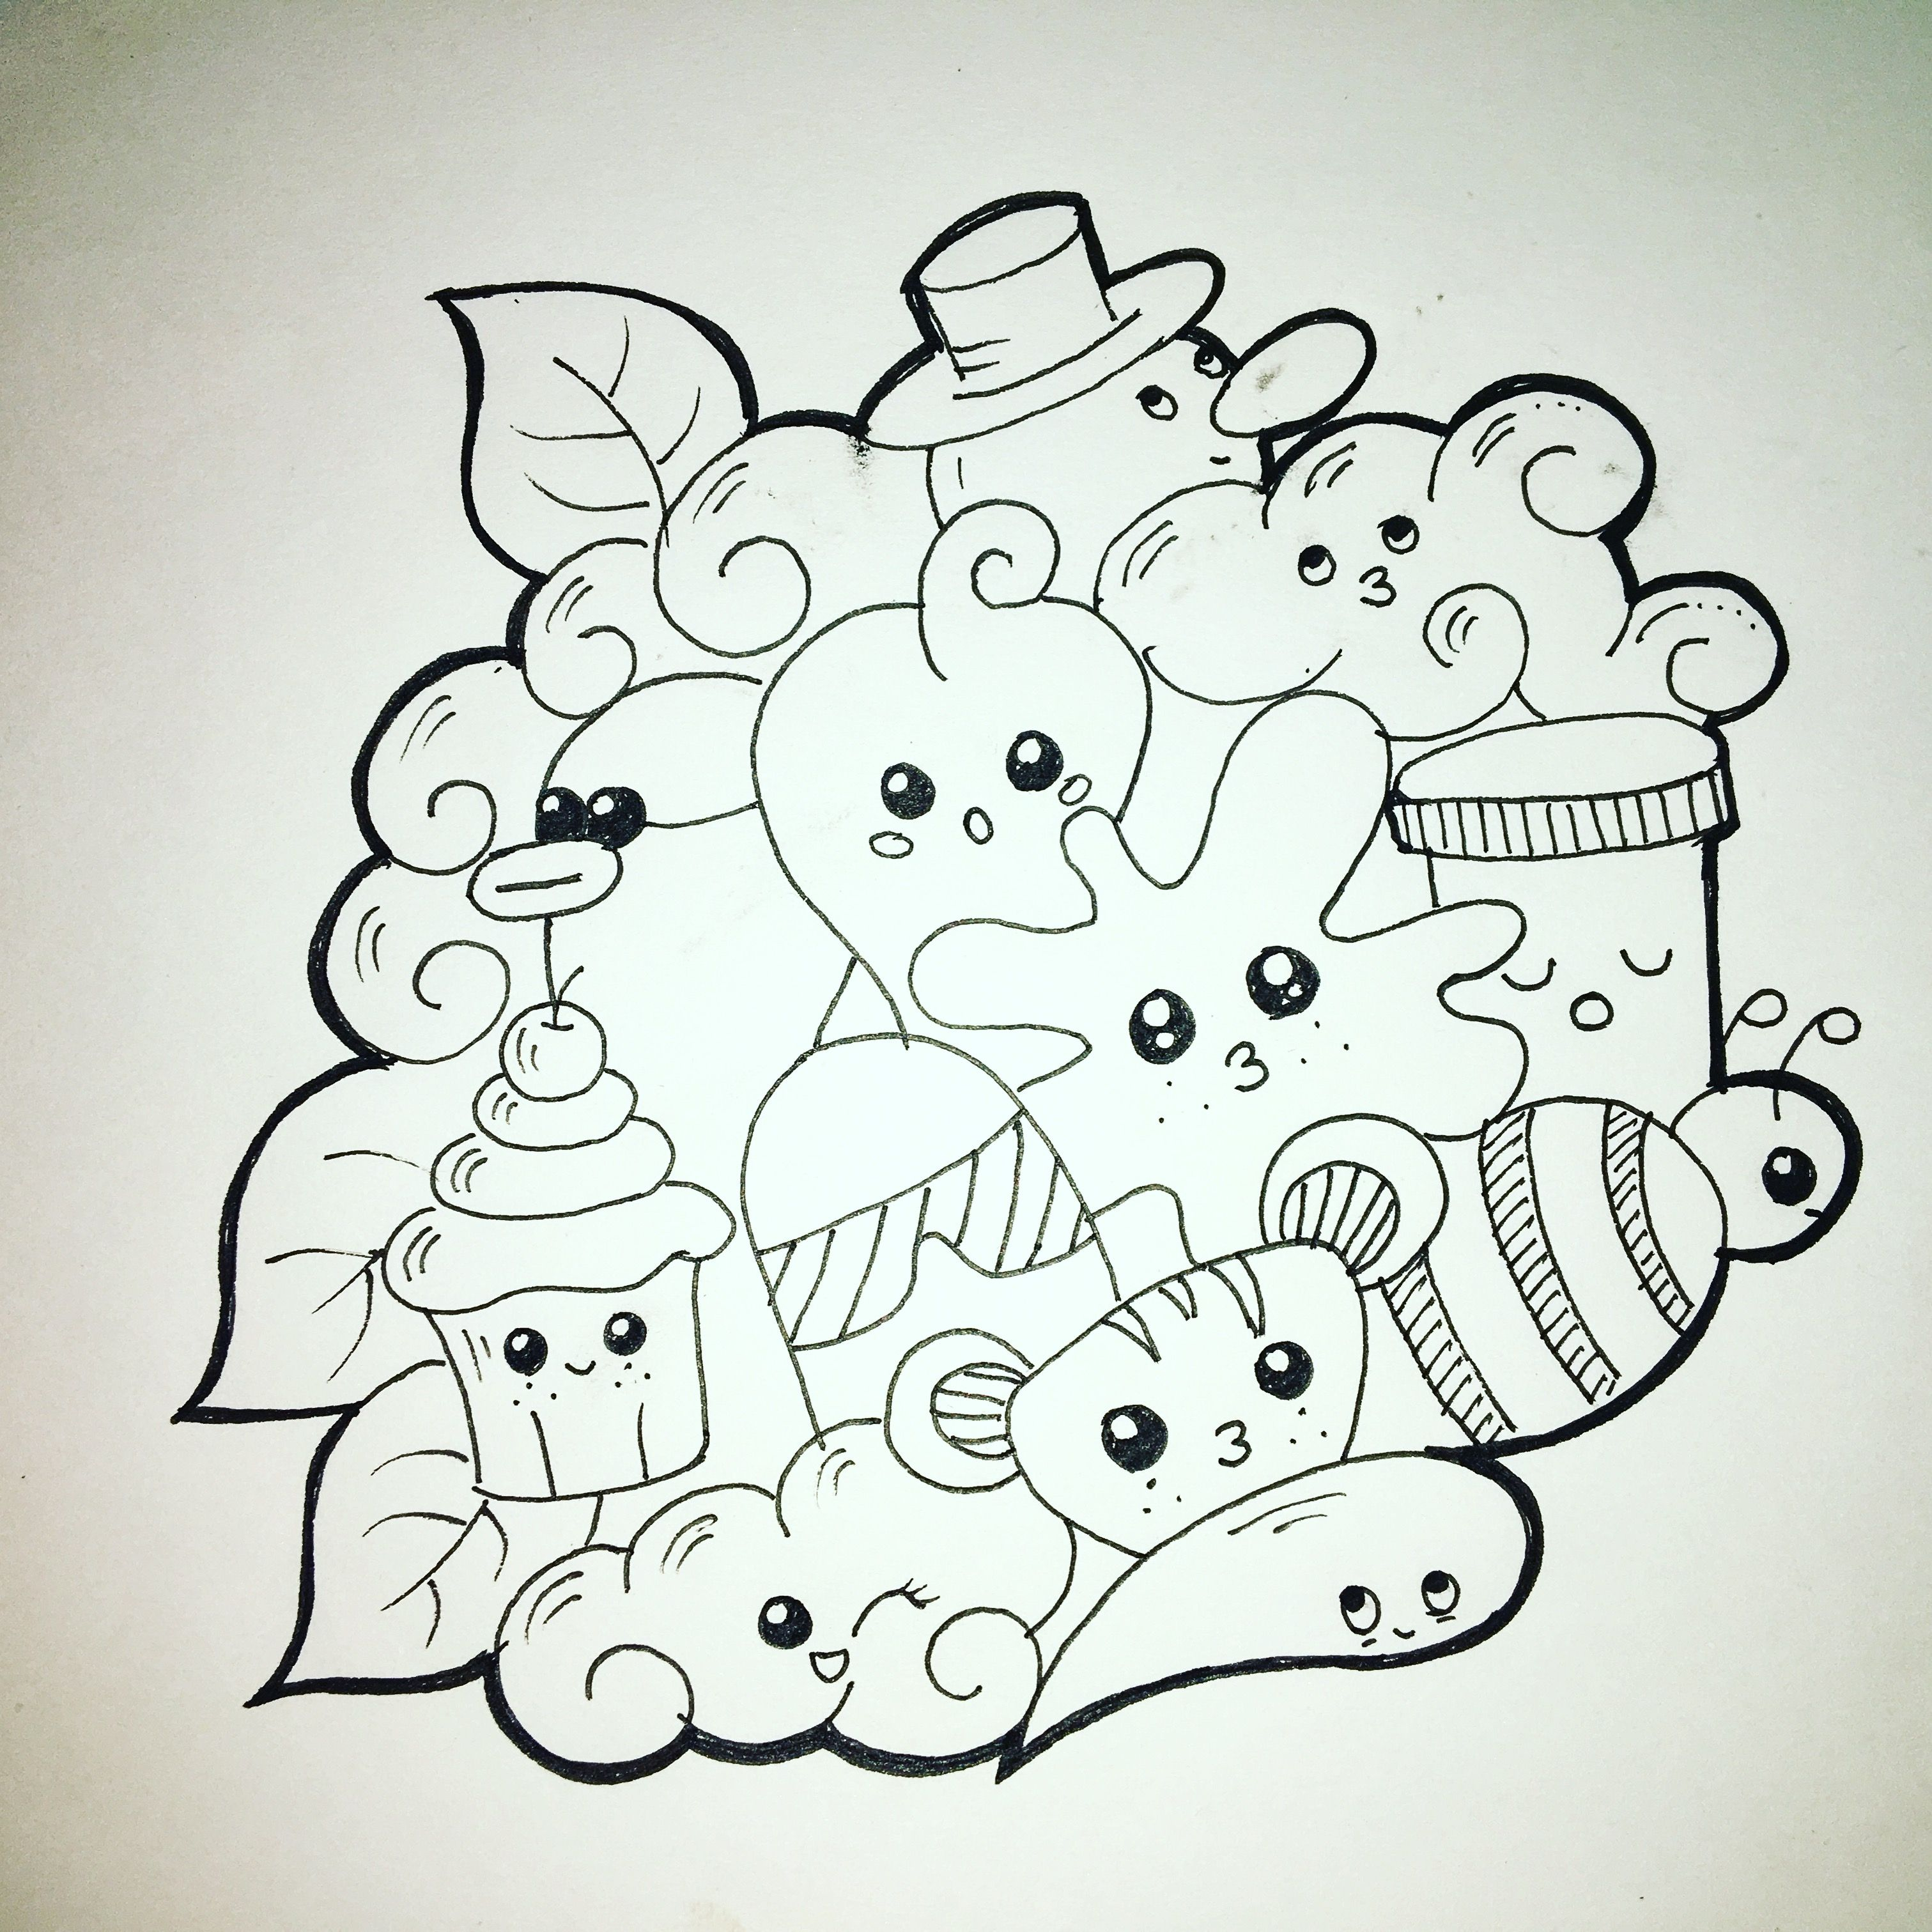 Cool Doodle Art Names